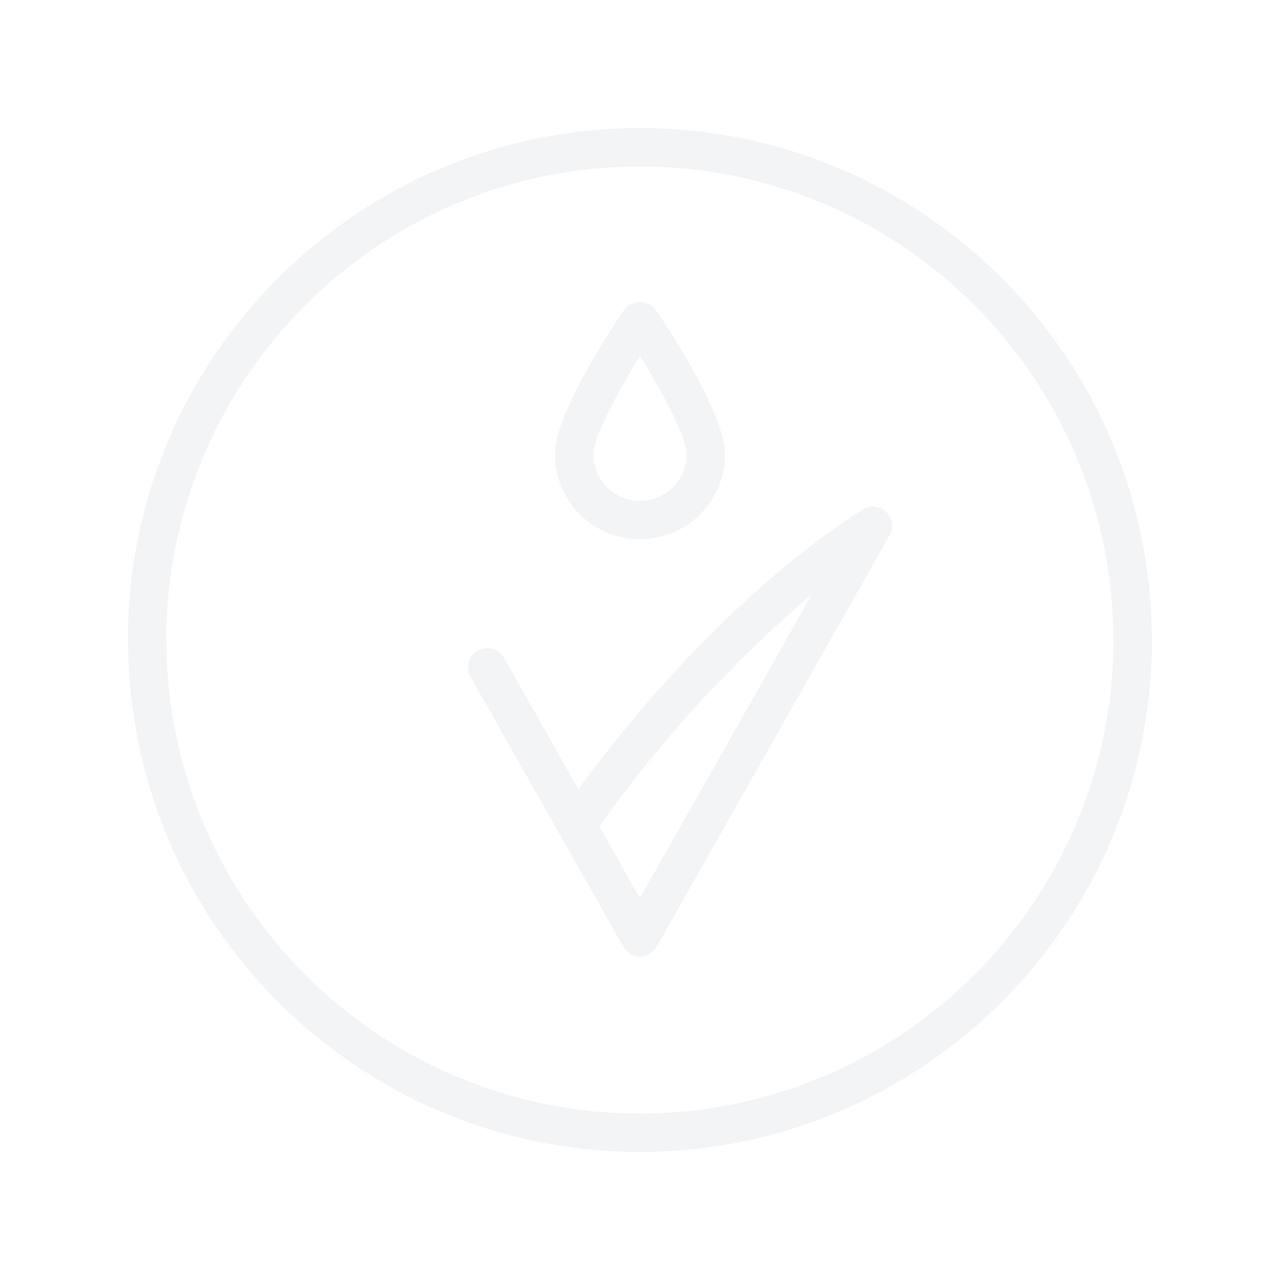 HOLIKA HOLIKA Pig-Nose Clear Black Head 3-Step Kit (Strong) 4g